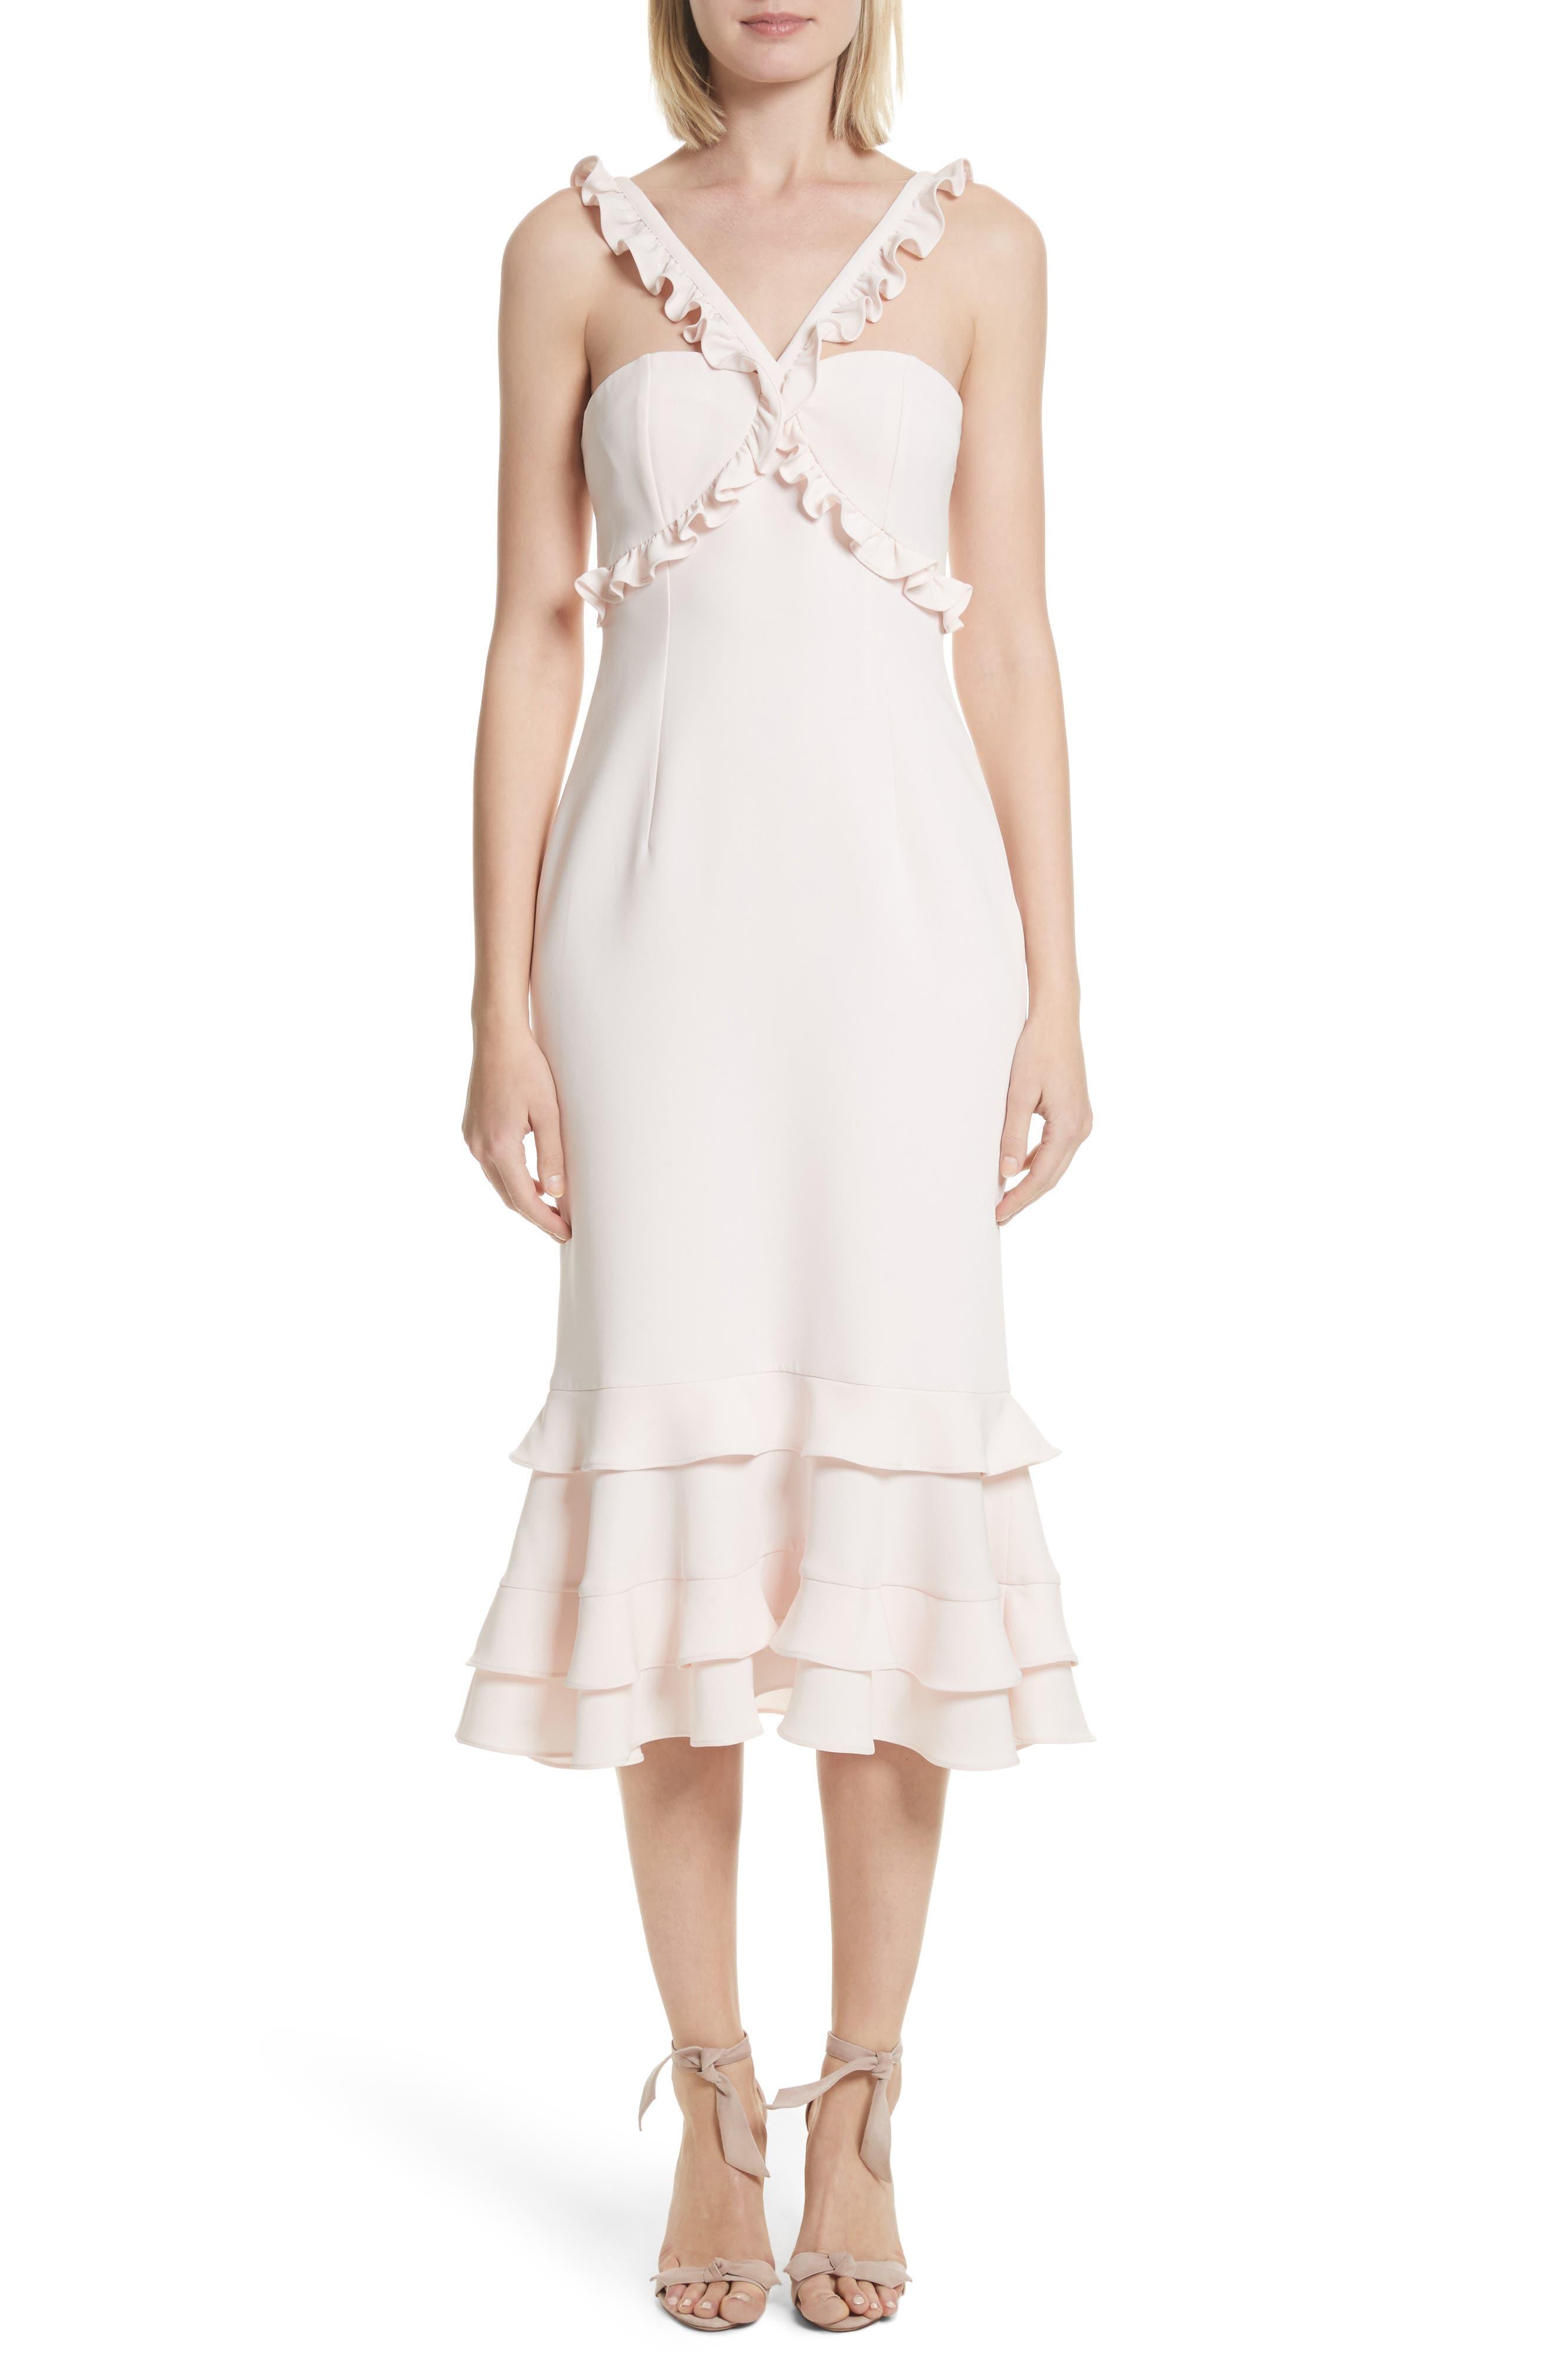 Cinq à Sept Kimora Ruffle Detail Dress